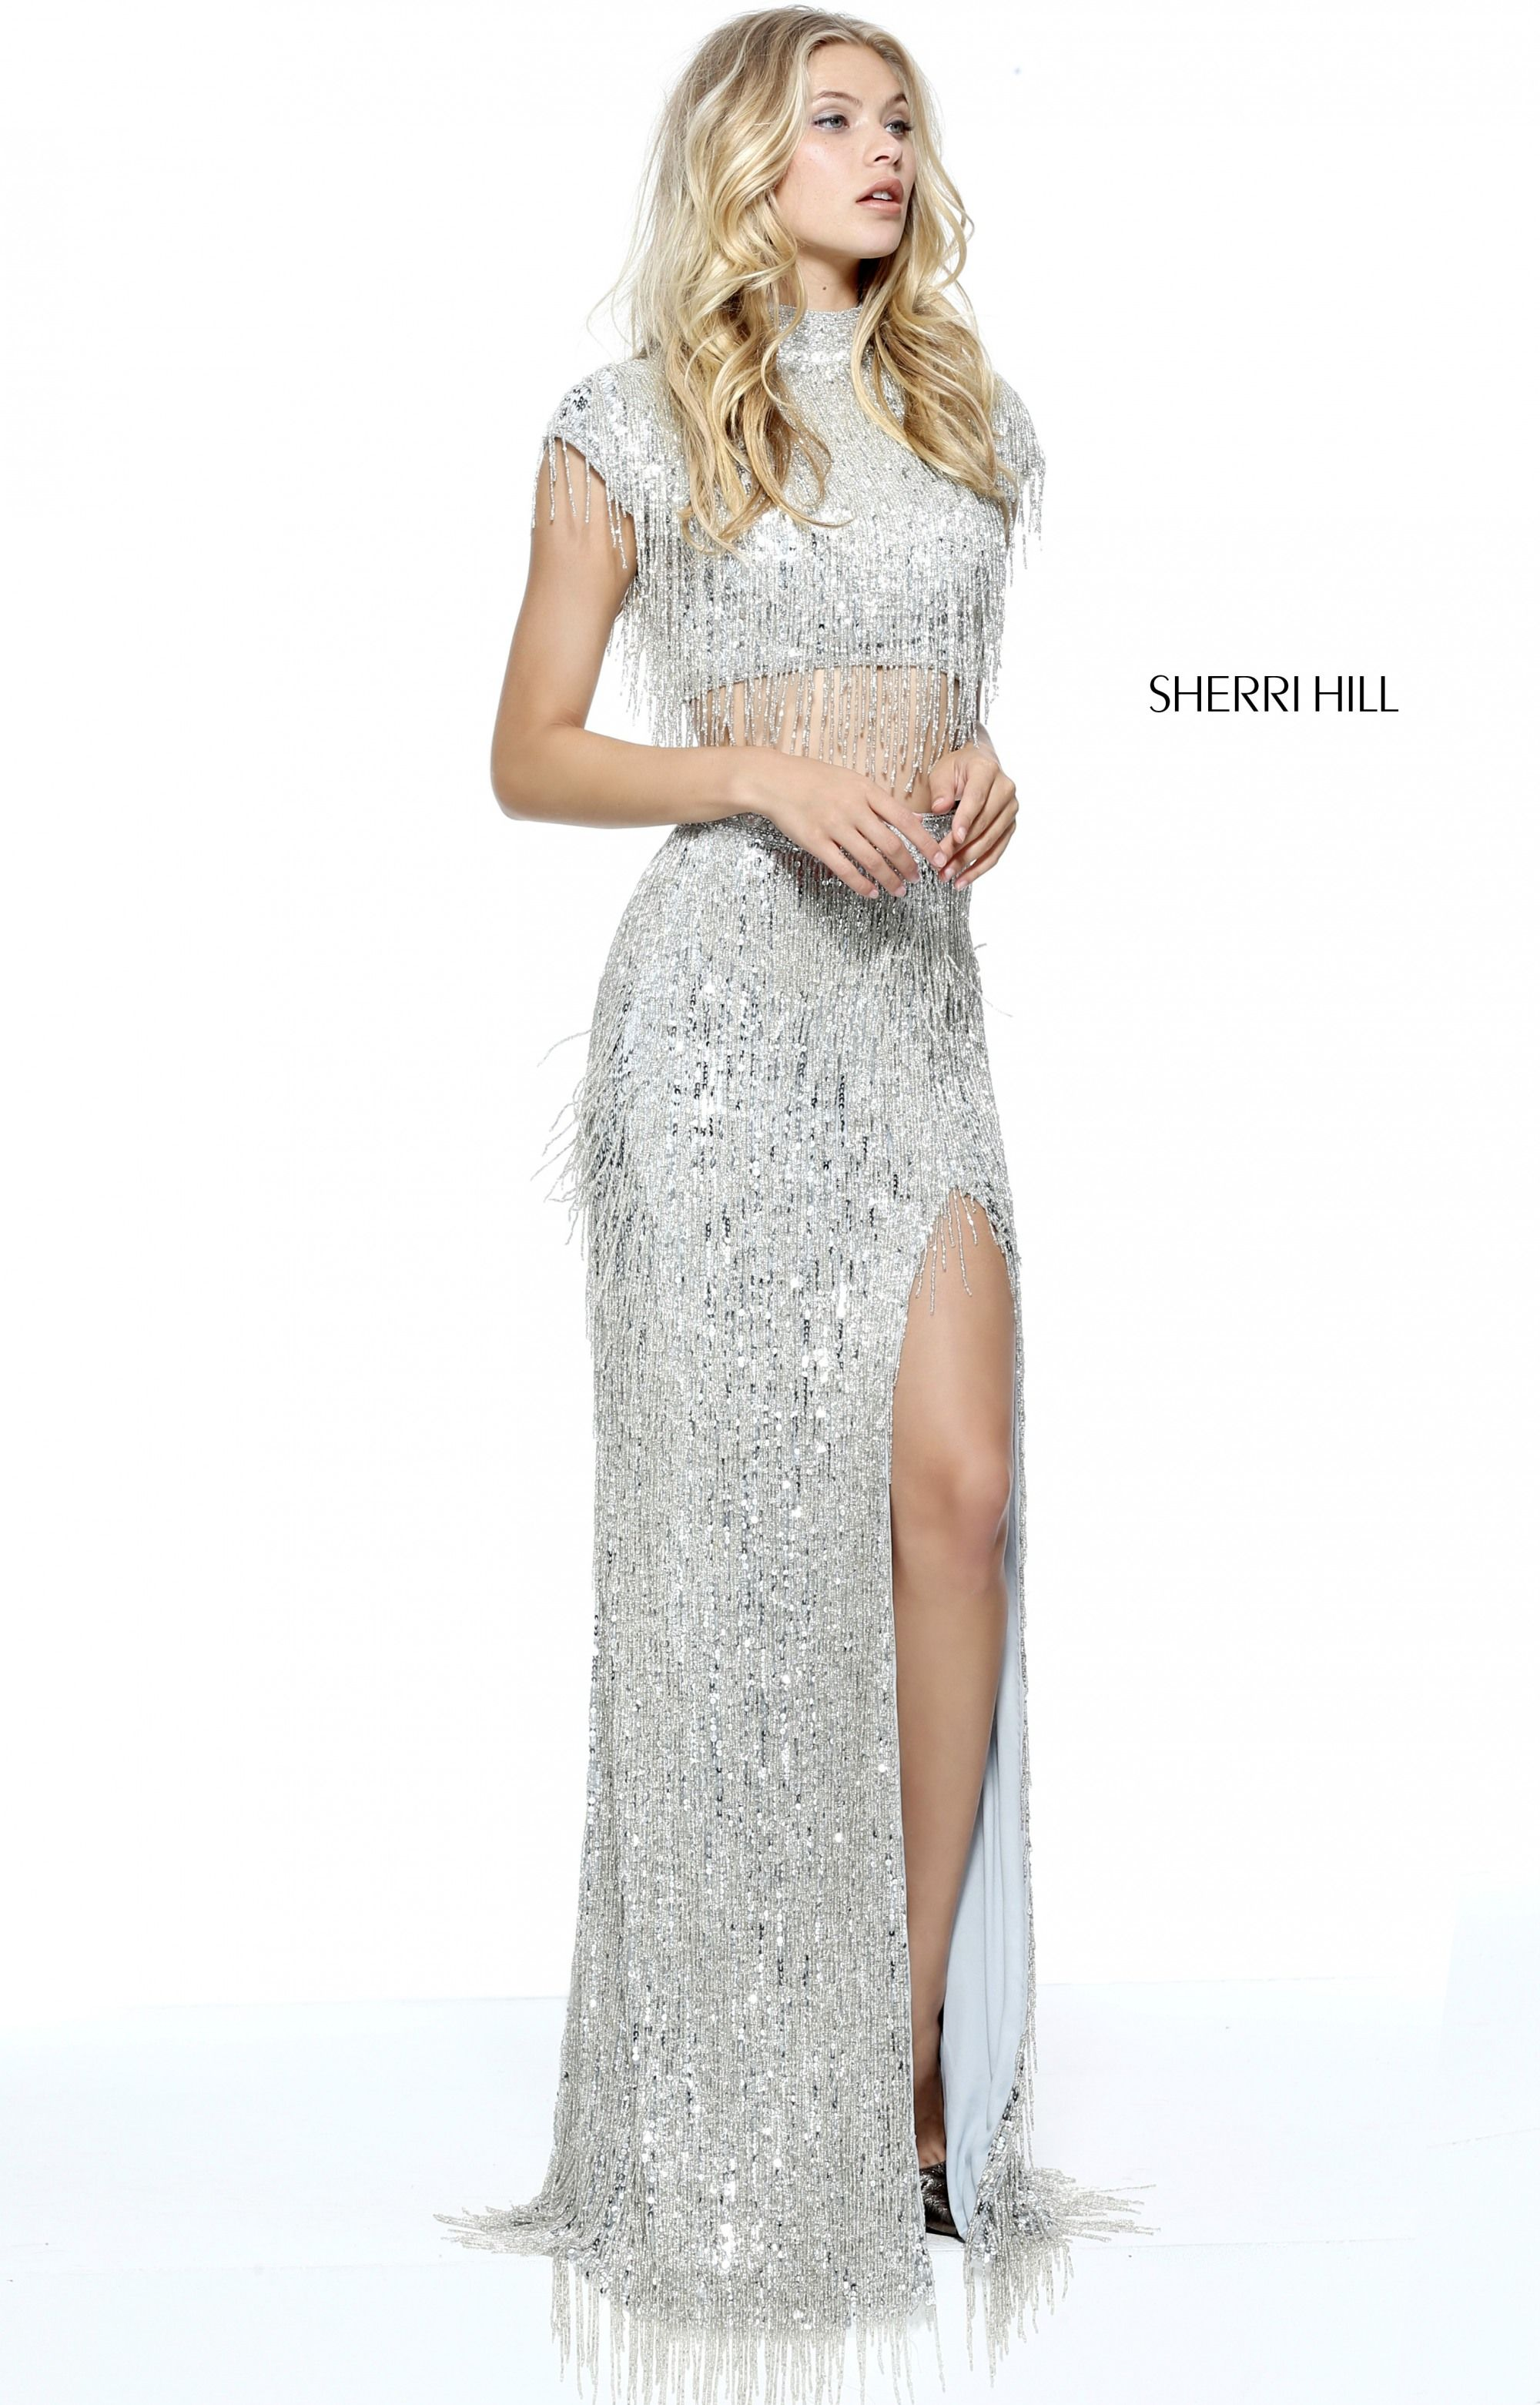 6ed4bf18c5e Beaded fringe adorns this Sherri Hill 51220 two-piece prom dress ...